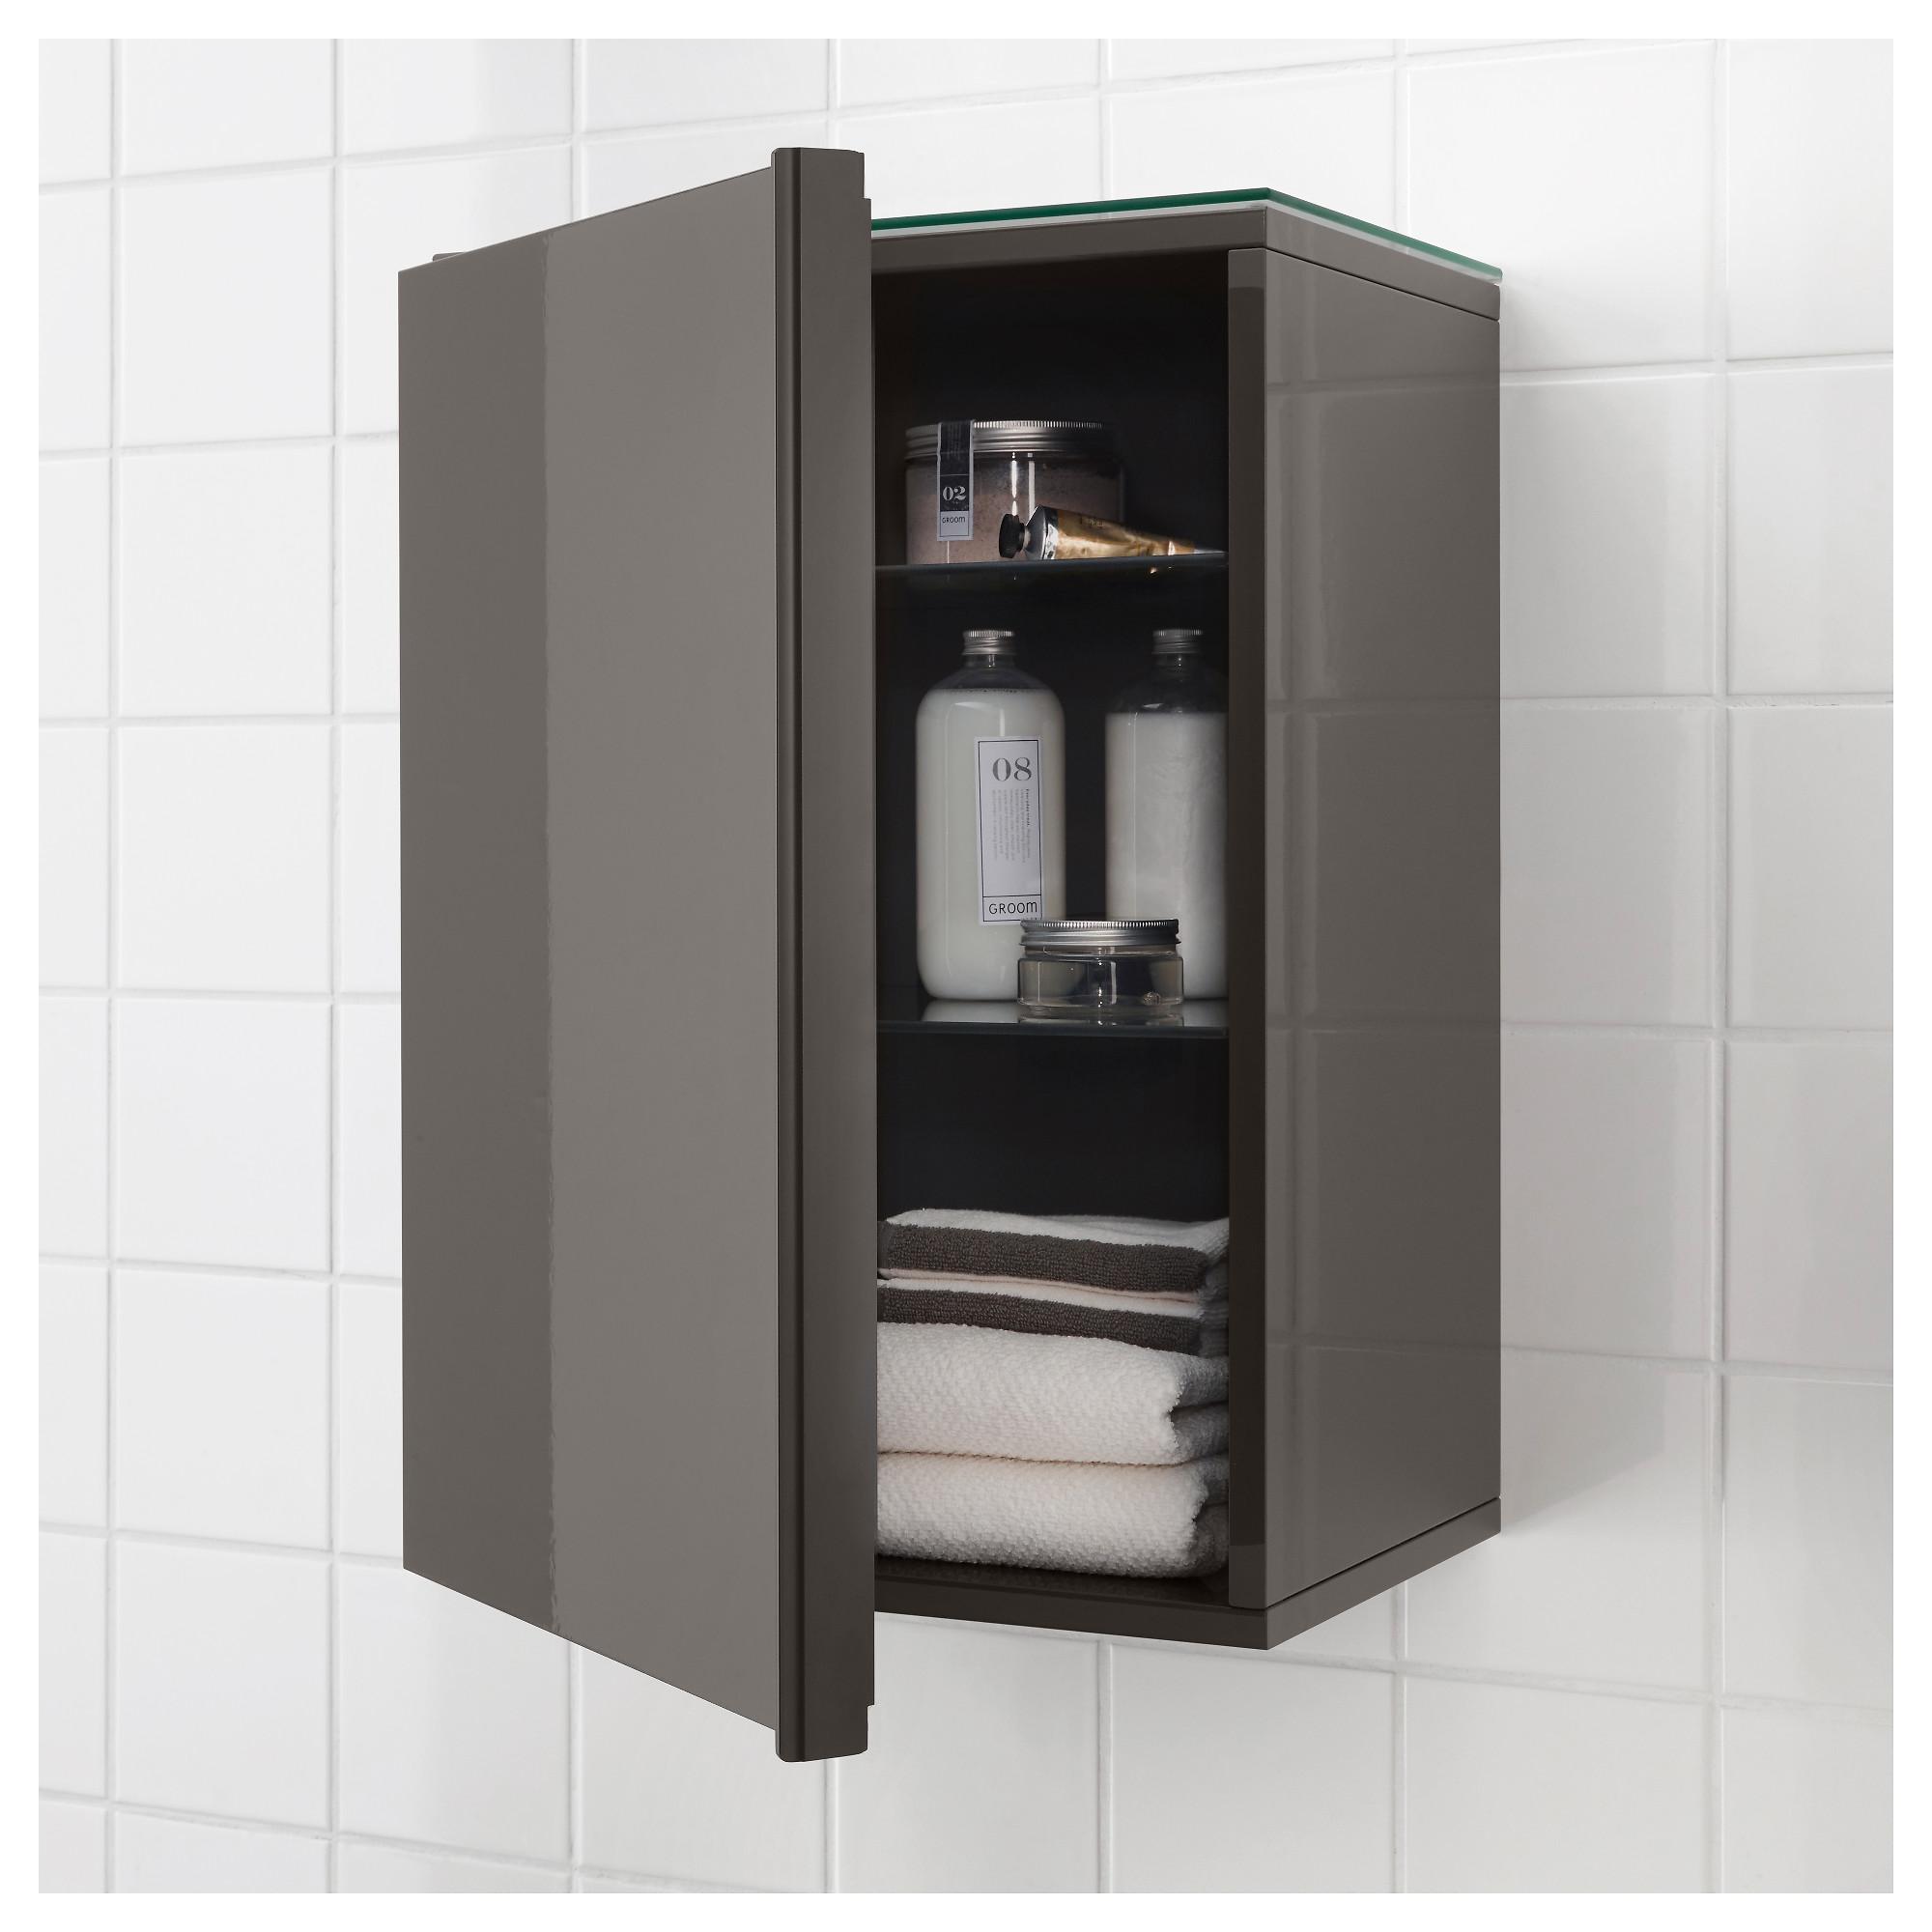 Ikea Morgon Wall Cabinet With 1 Door High Gloss Gray